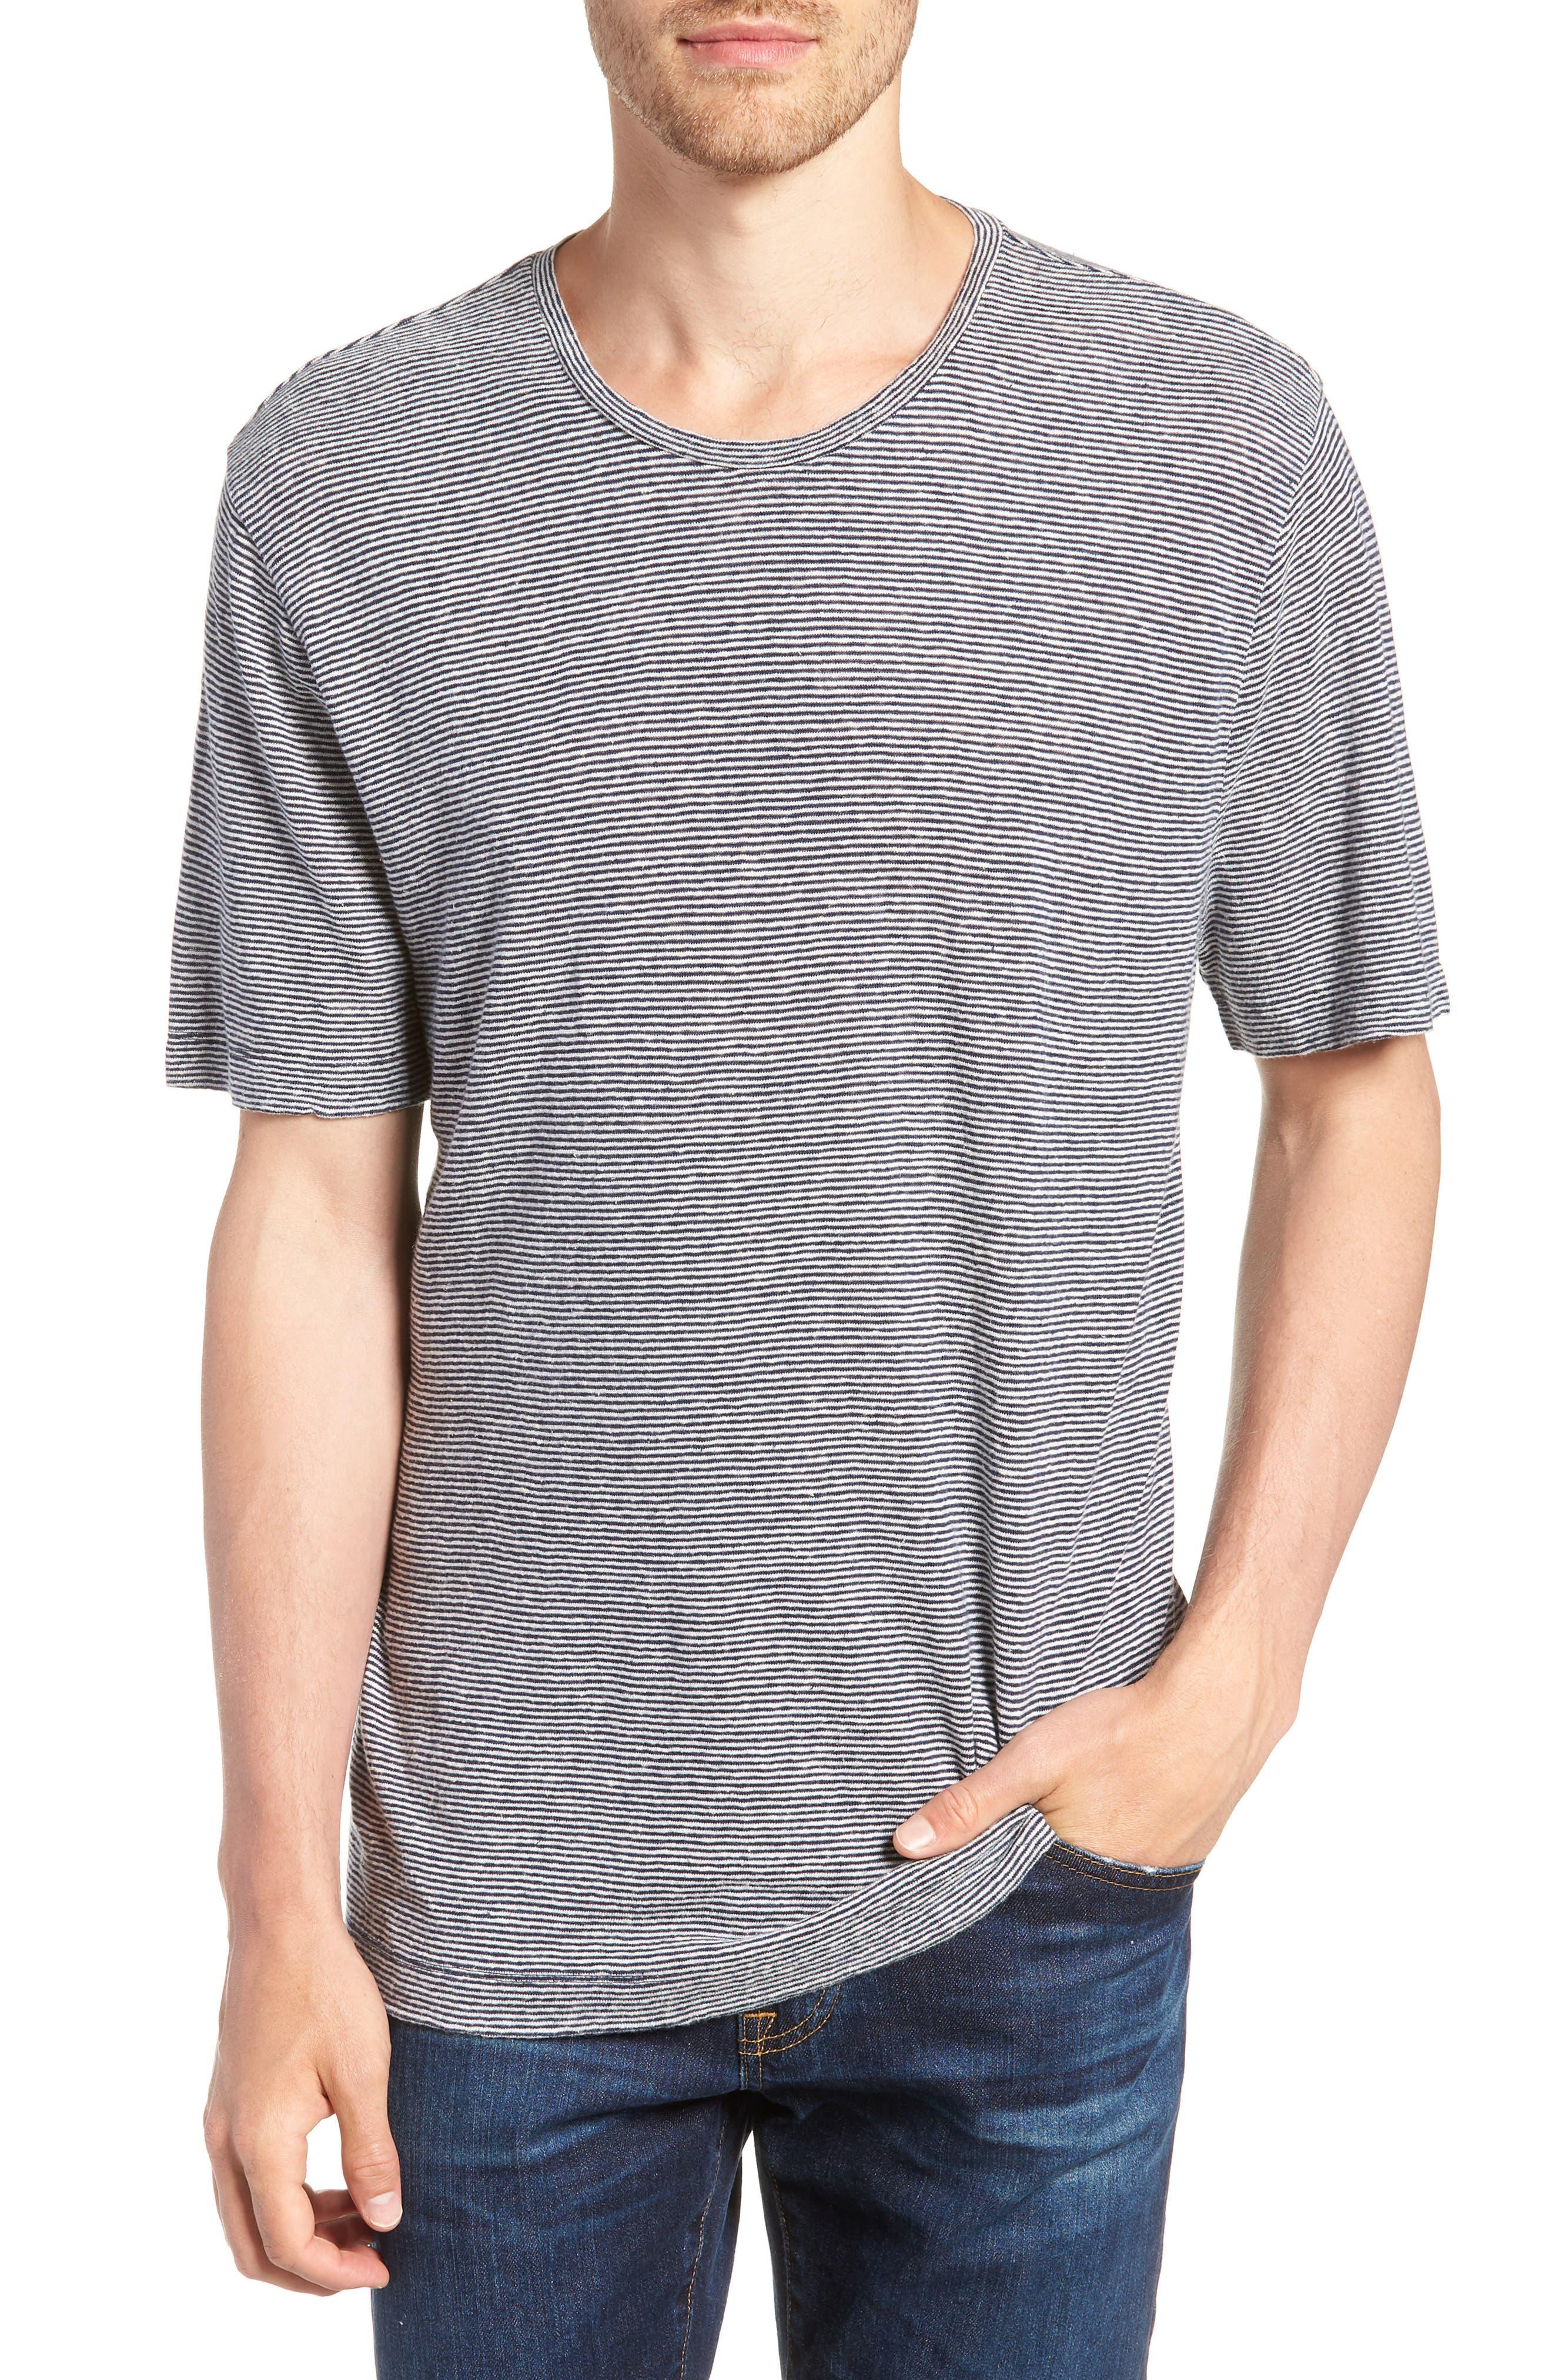 Feeder Stripe Linen Blend Jersey T-Shirt,                         Main,                         color, Navy Iris White Stripe